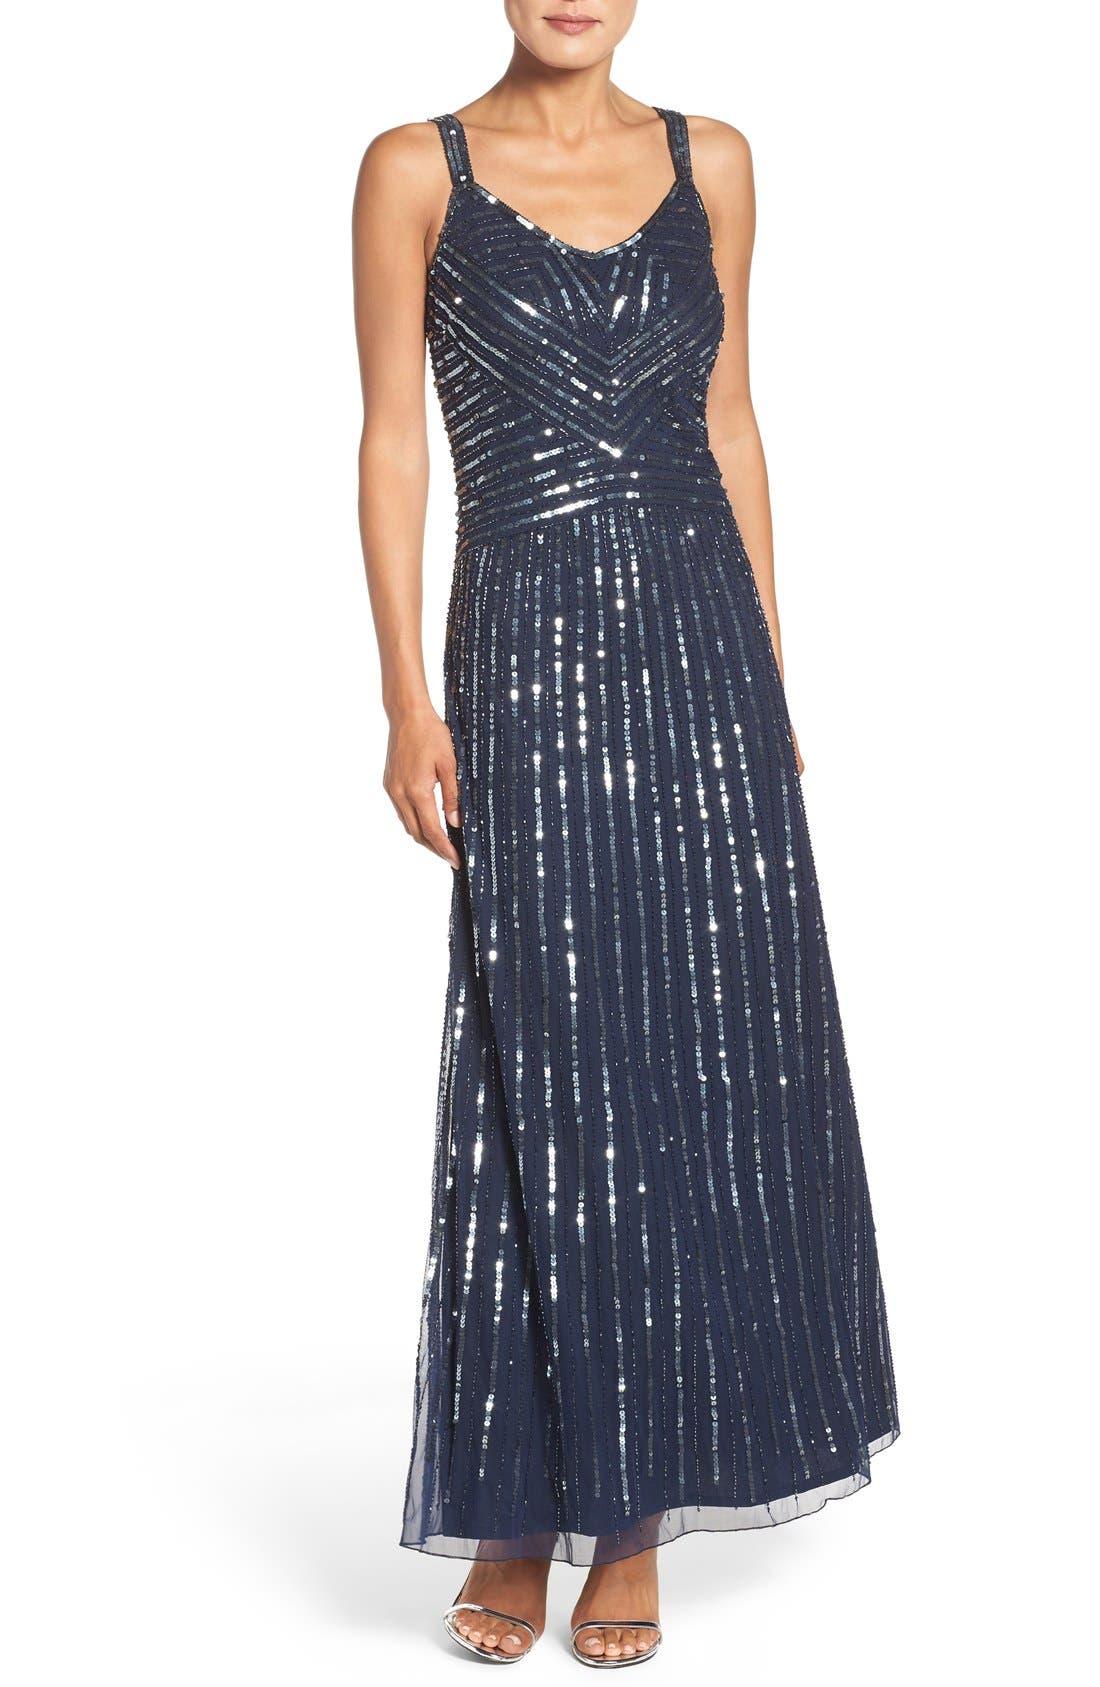 Alternate Image 1 Selected - Pisarro Nights Embellished Mesh Fit & Flare Dress